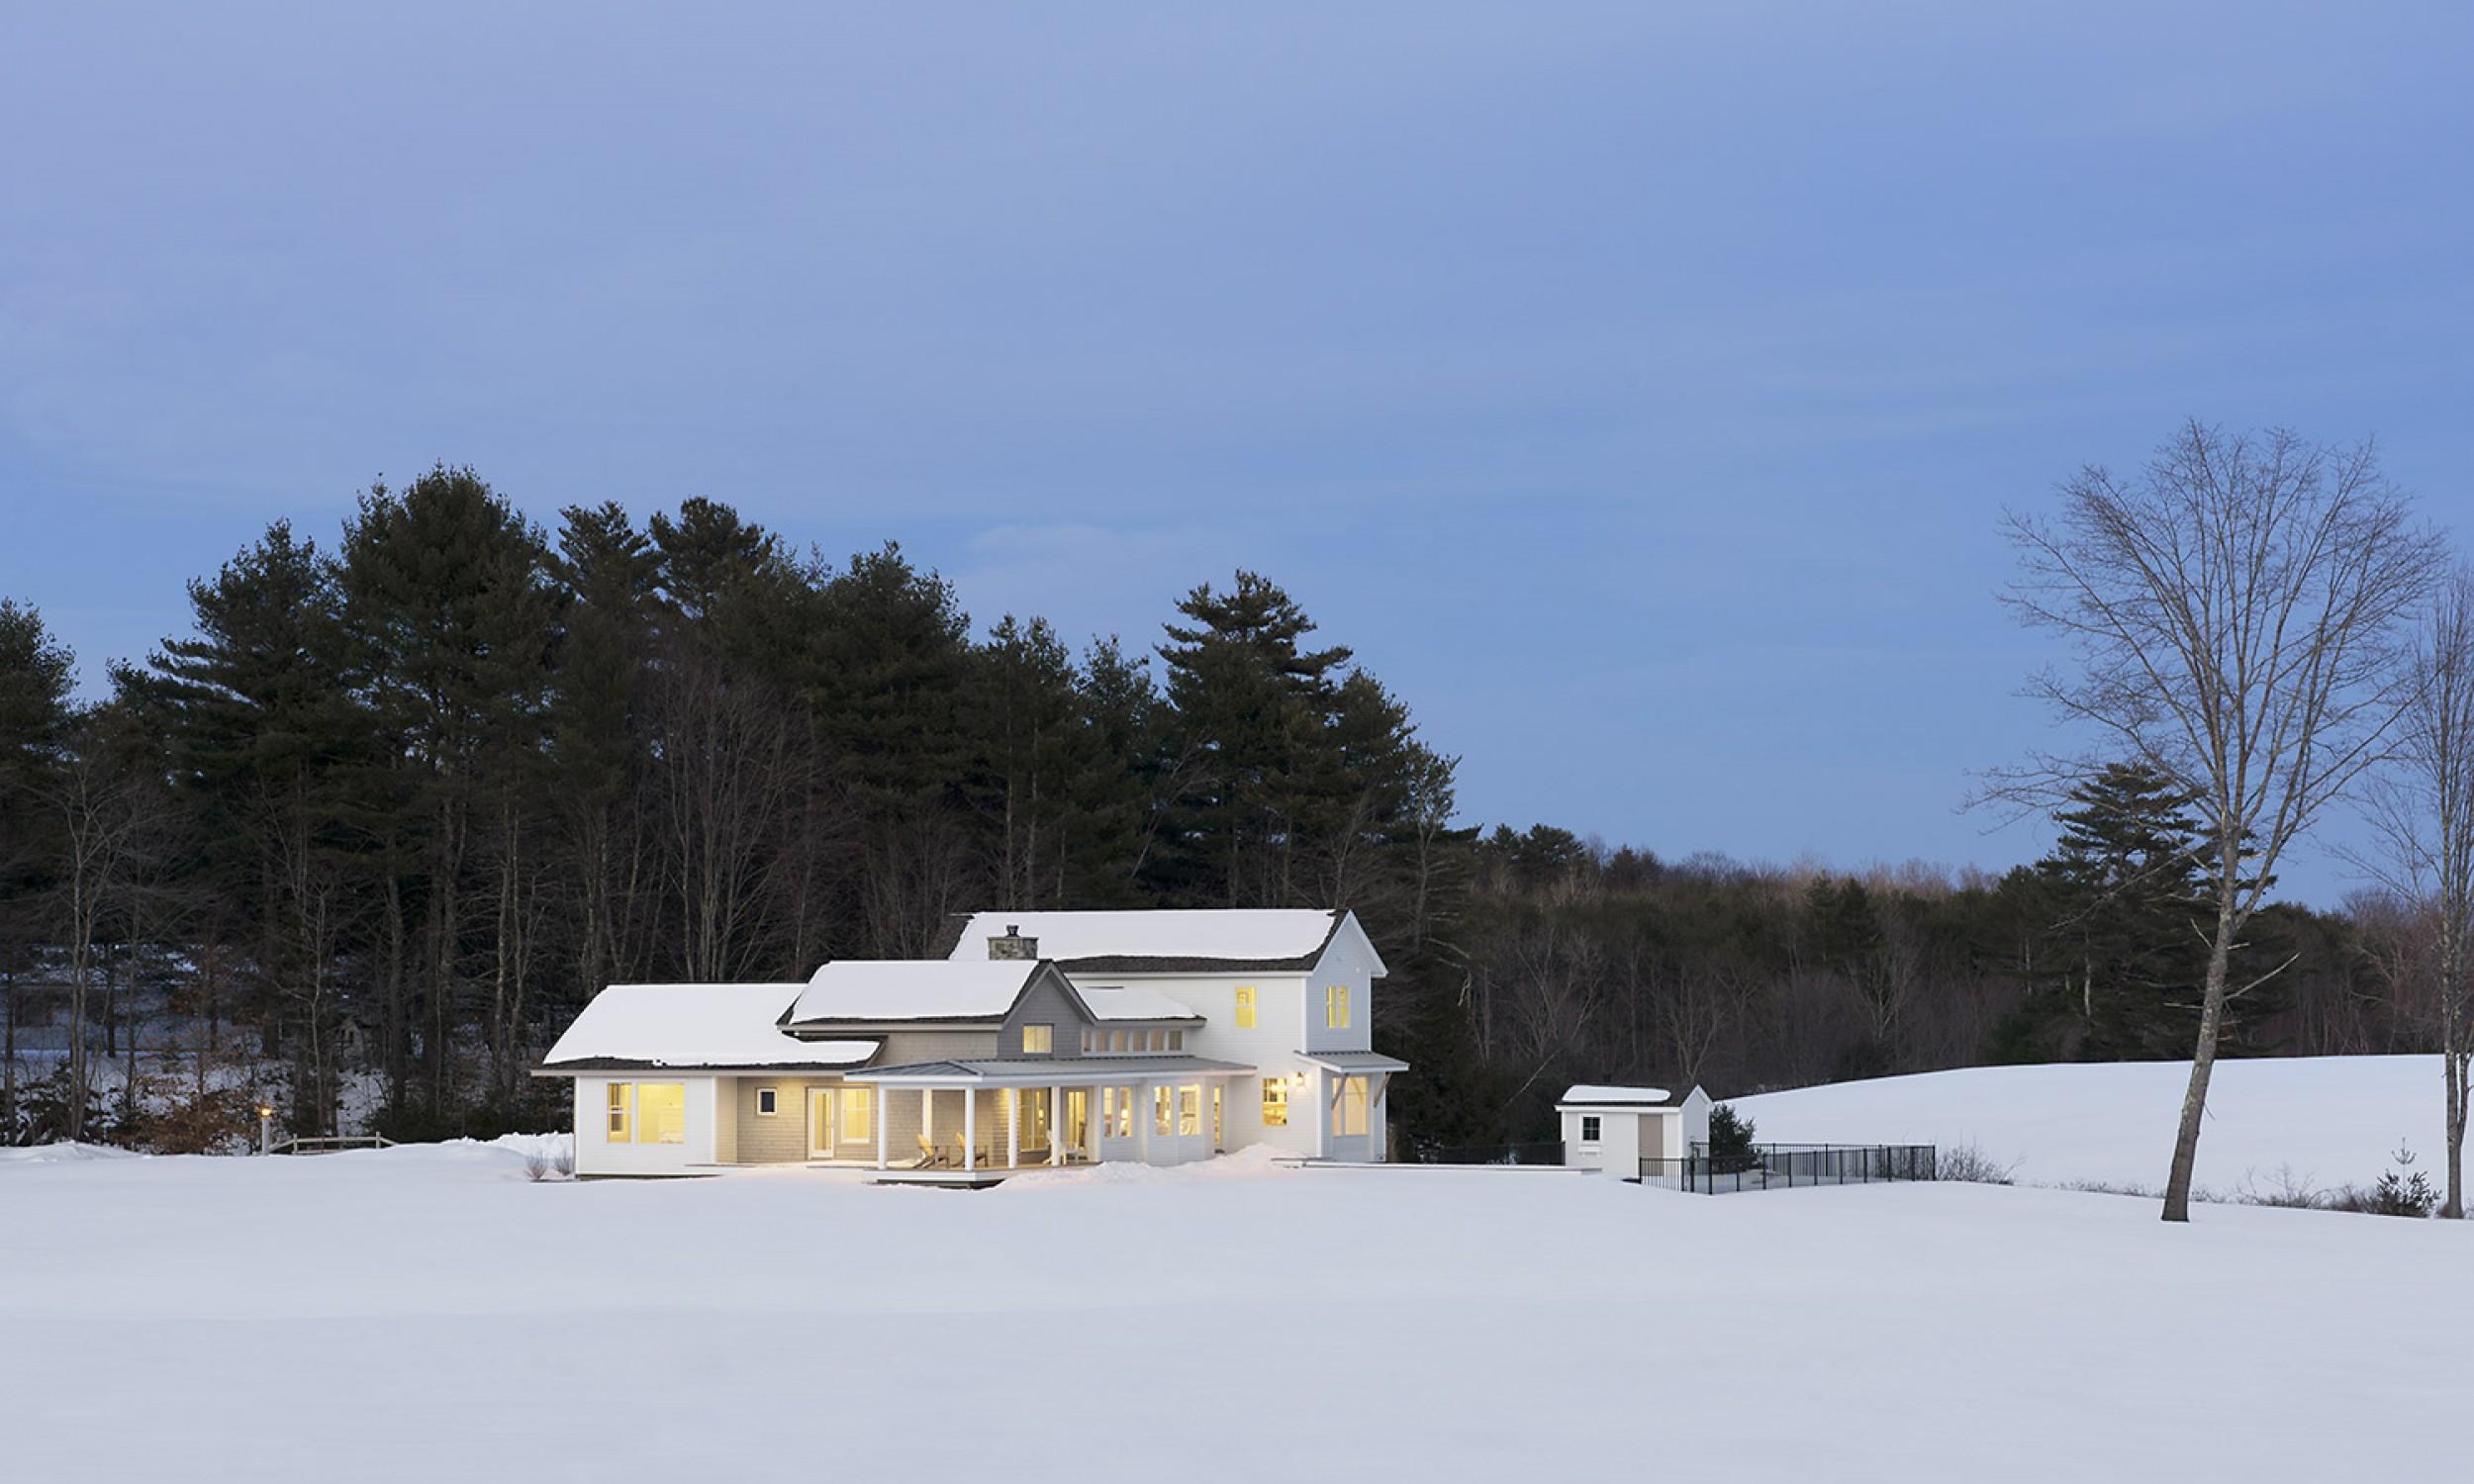 Modern Farmhouse, cedar shingles, white siding, clapboards, Maine Architect, winter scene